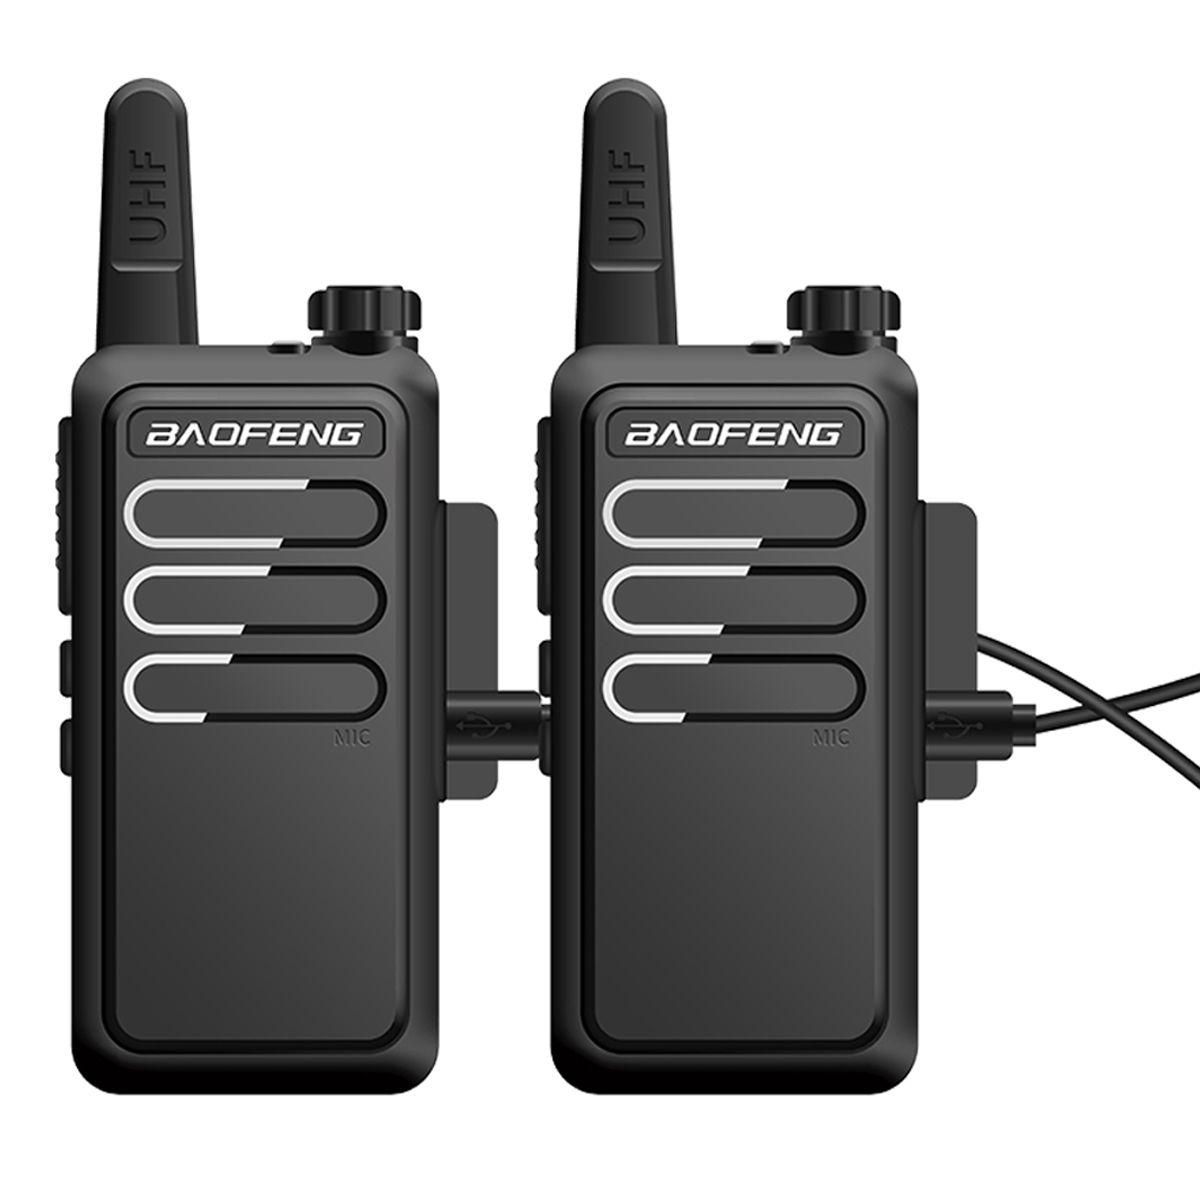 VOX 충전 양방향 라디오 방송국 핸디 무전기를 충전 2020 새로운 2 개 보풍 BF-C9 미니 무전기 야의 USB